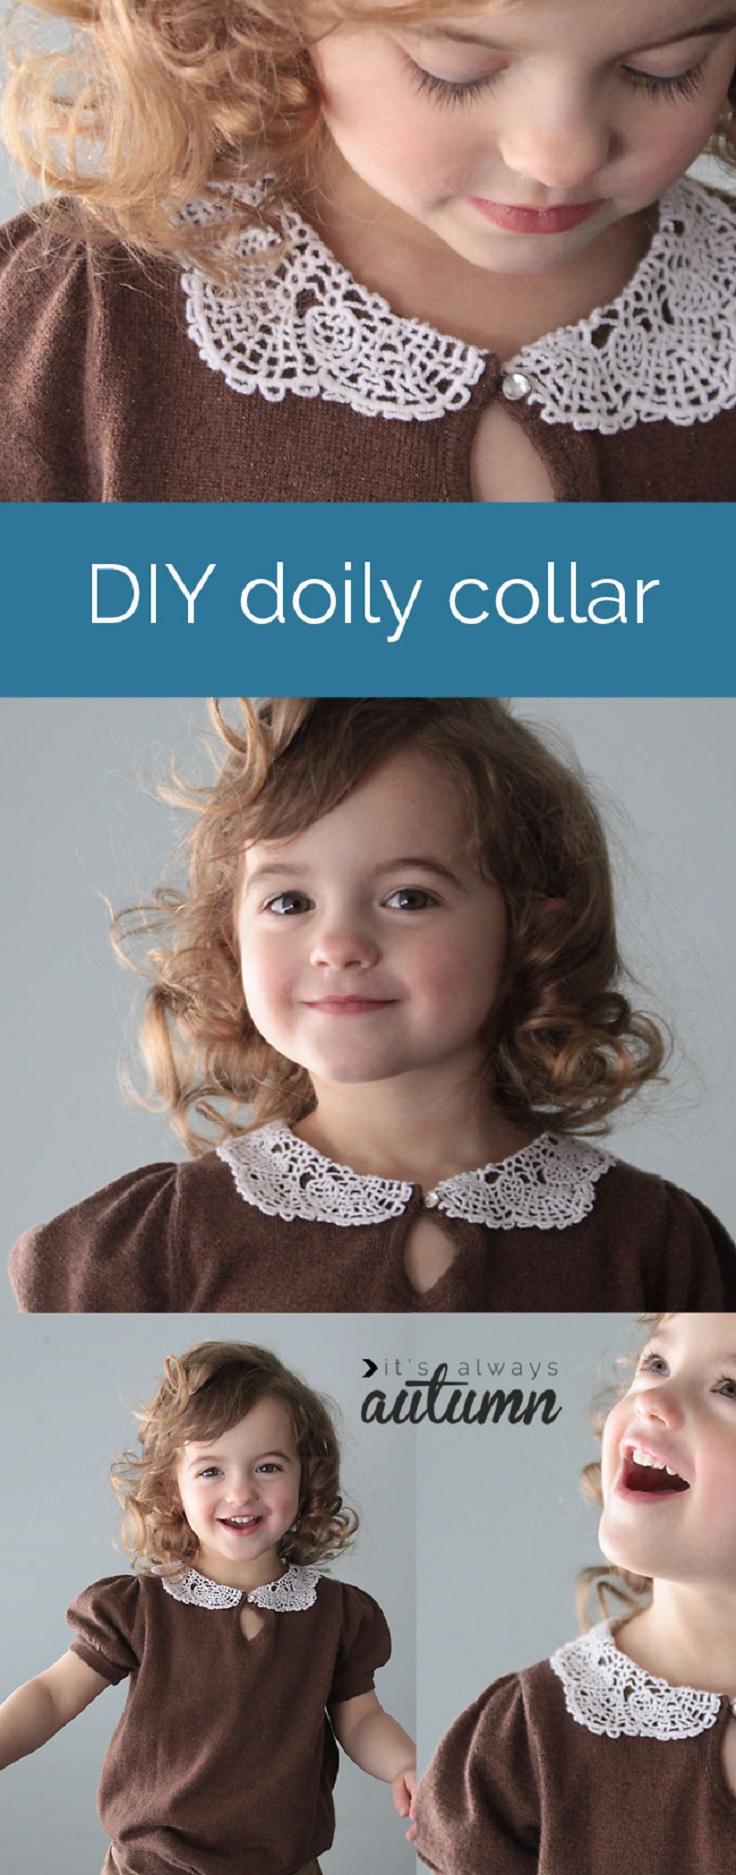 doily-collar